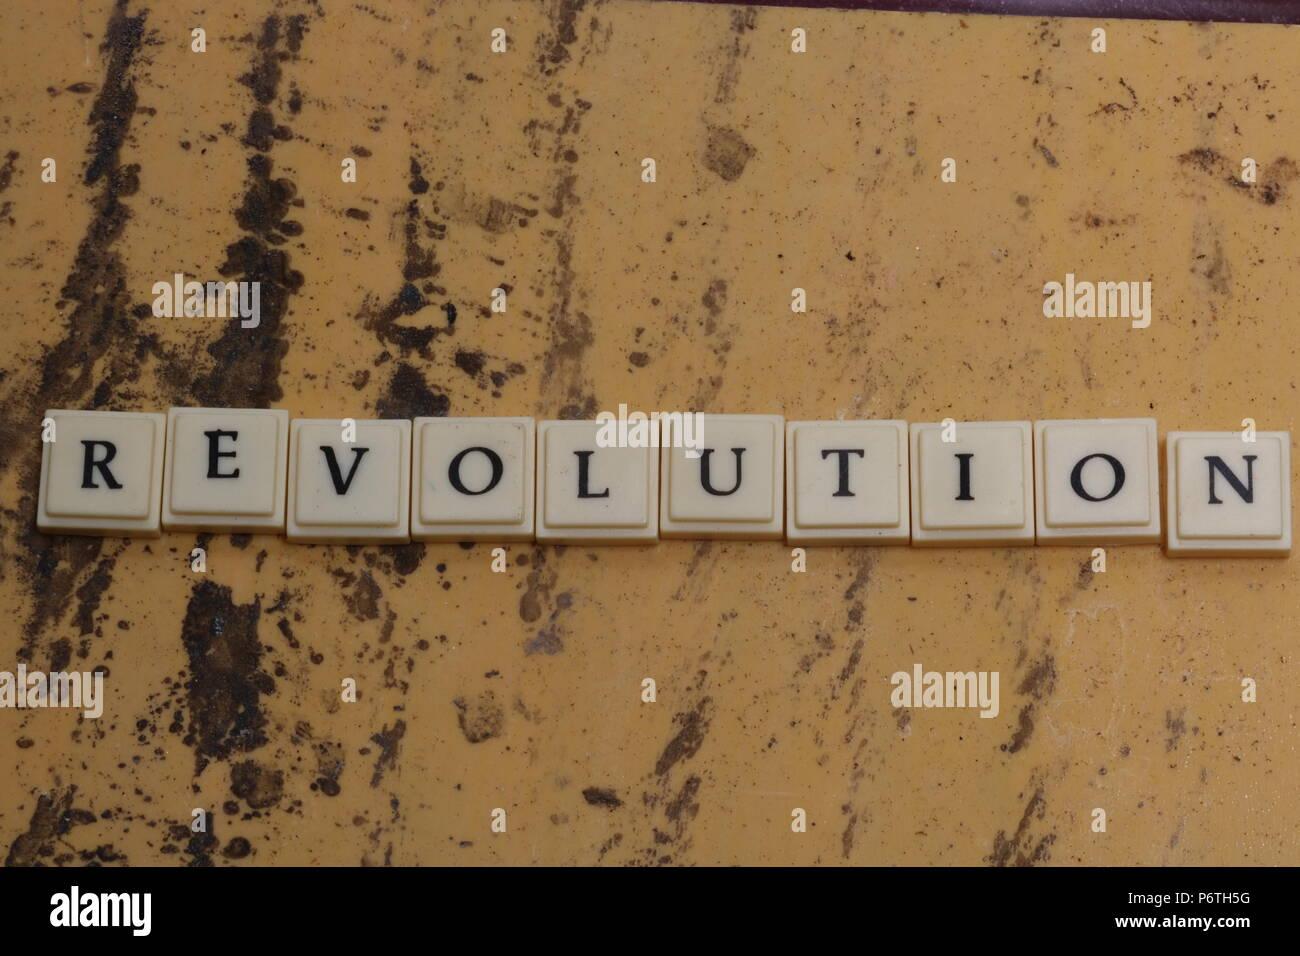 Revolution - Stock Image